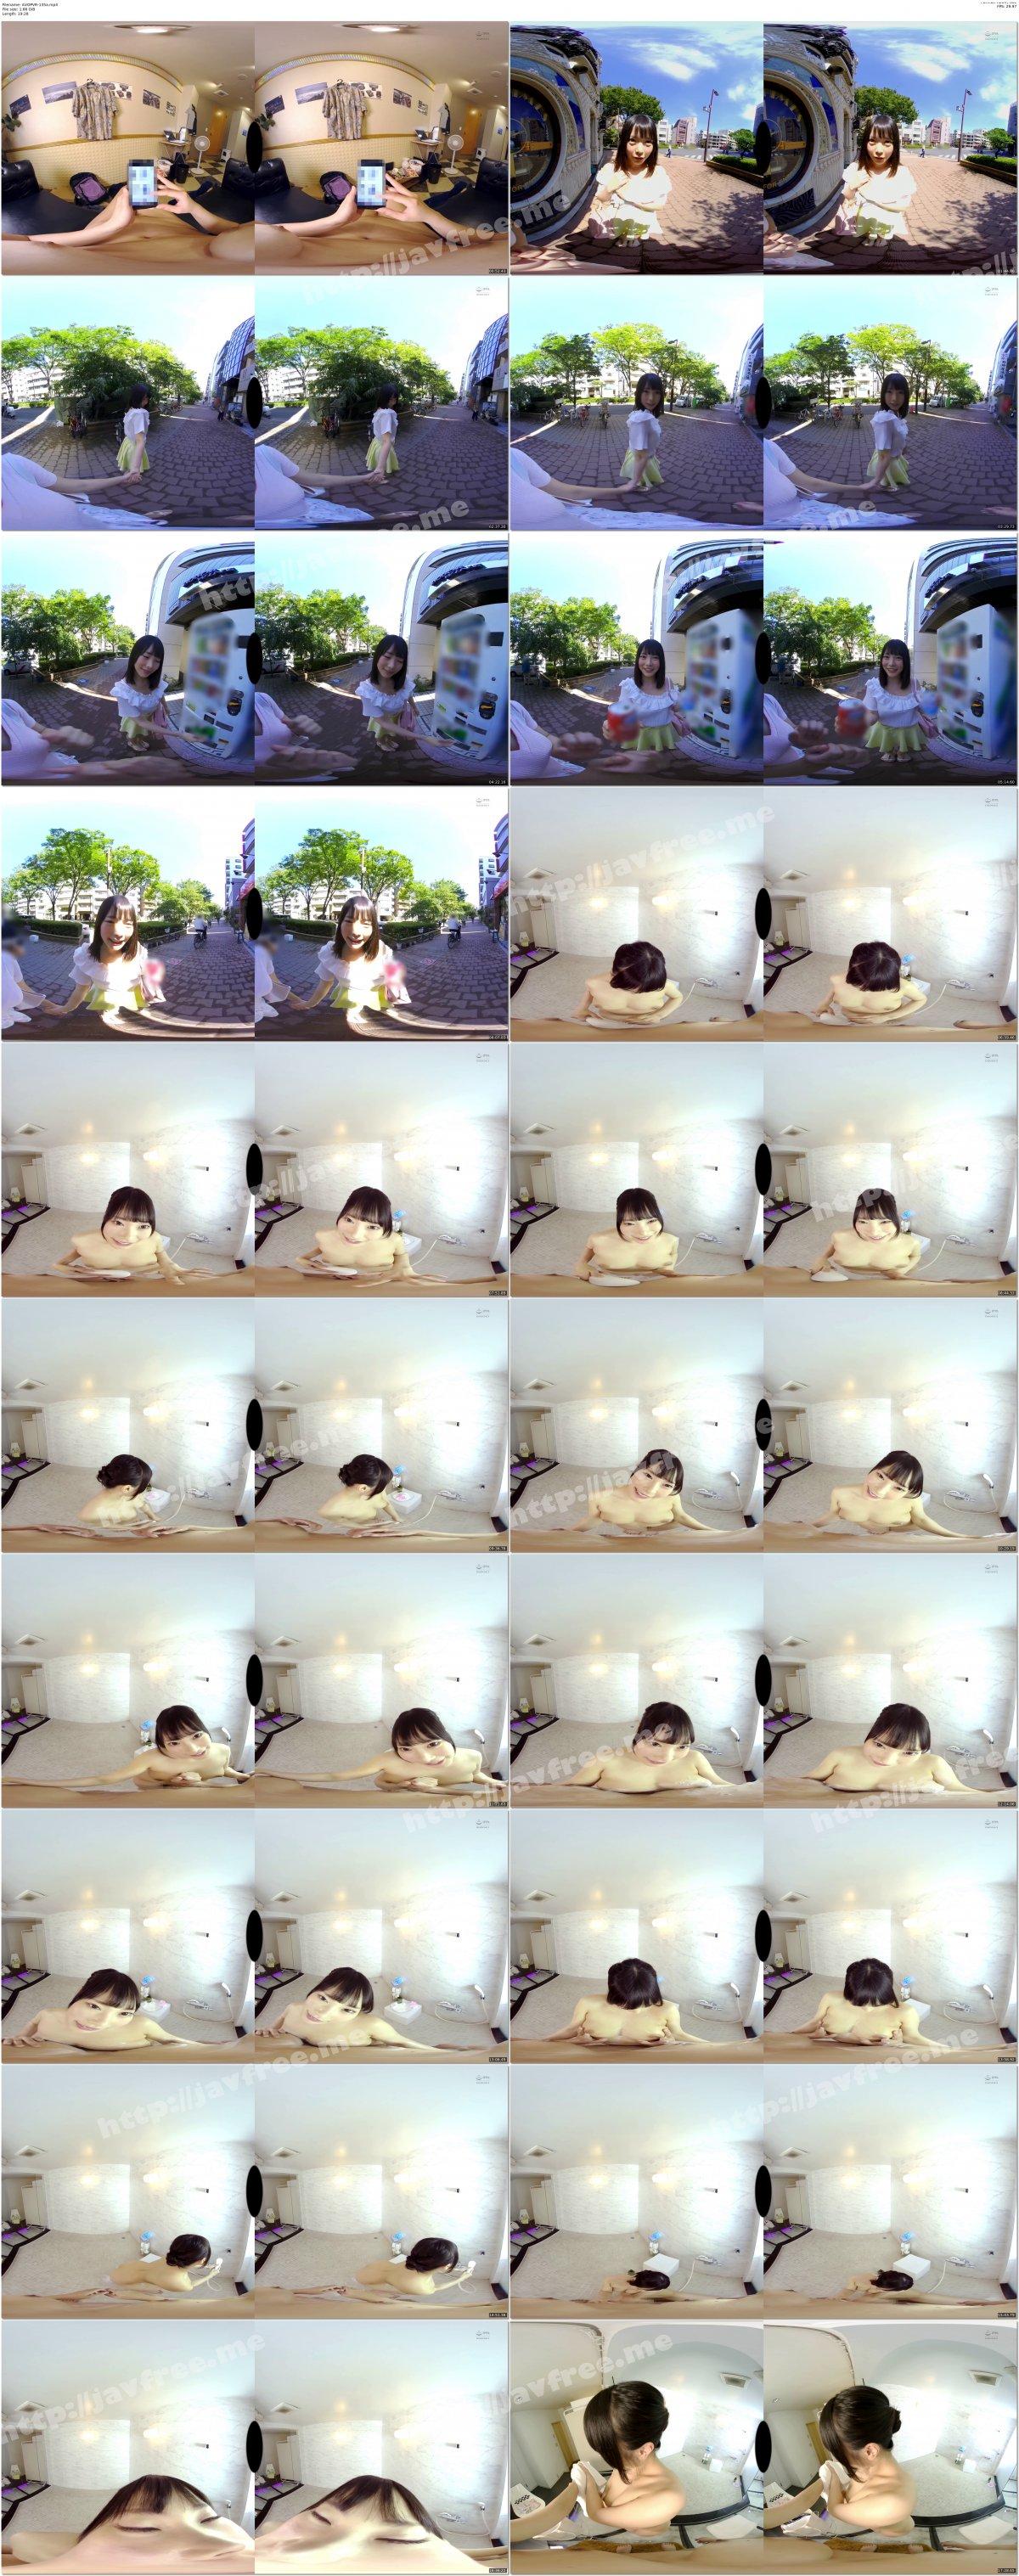 [AVOPVR-135] 【VR】レズ風俗 VR【視点移動×固定視点】で女の子になって、レズ風俗で責められまくって女子のイクを体感できたり制服プレイを楽しめる超高画質 VR - image AVOPVR-135a on https://javfree.me